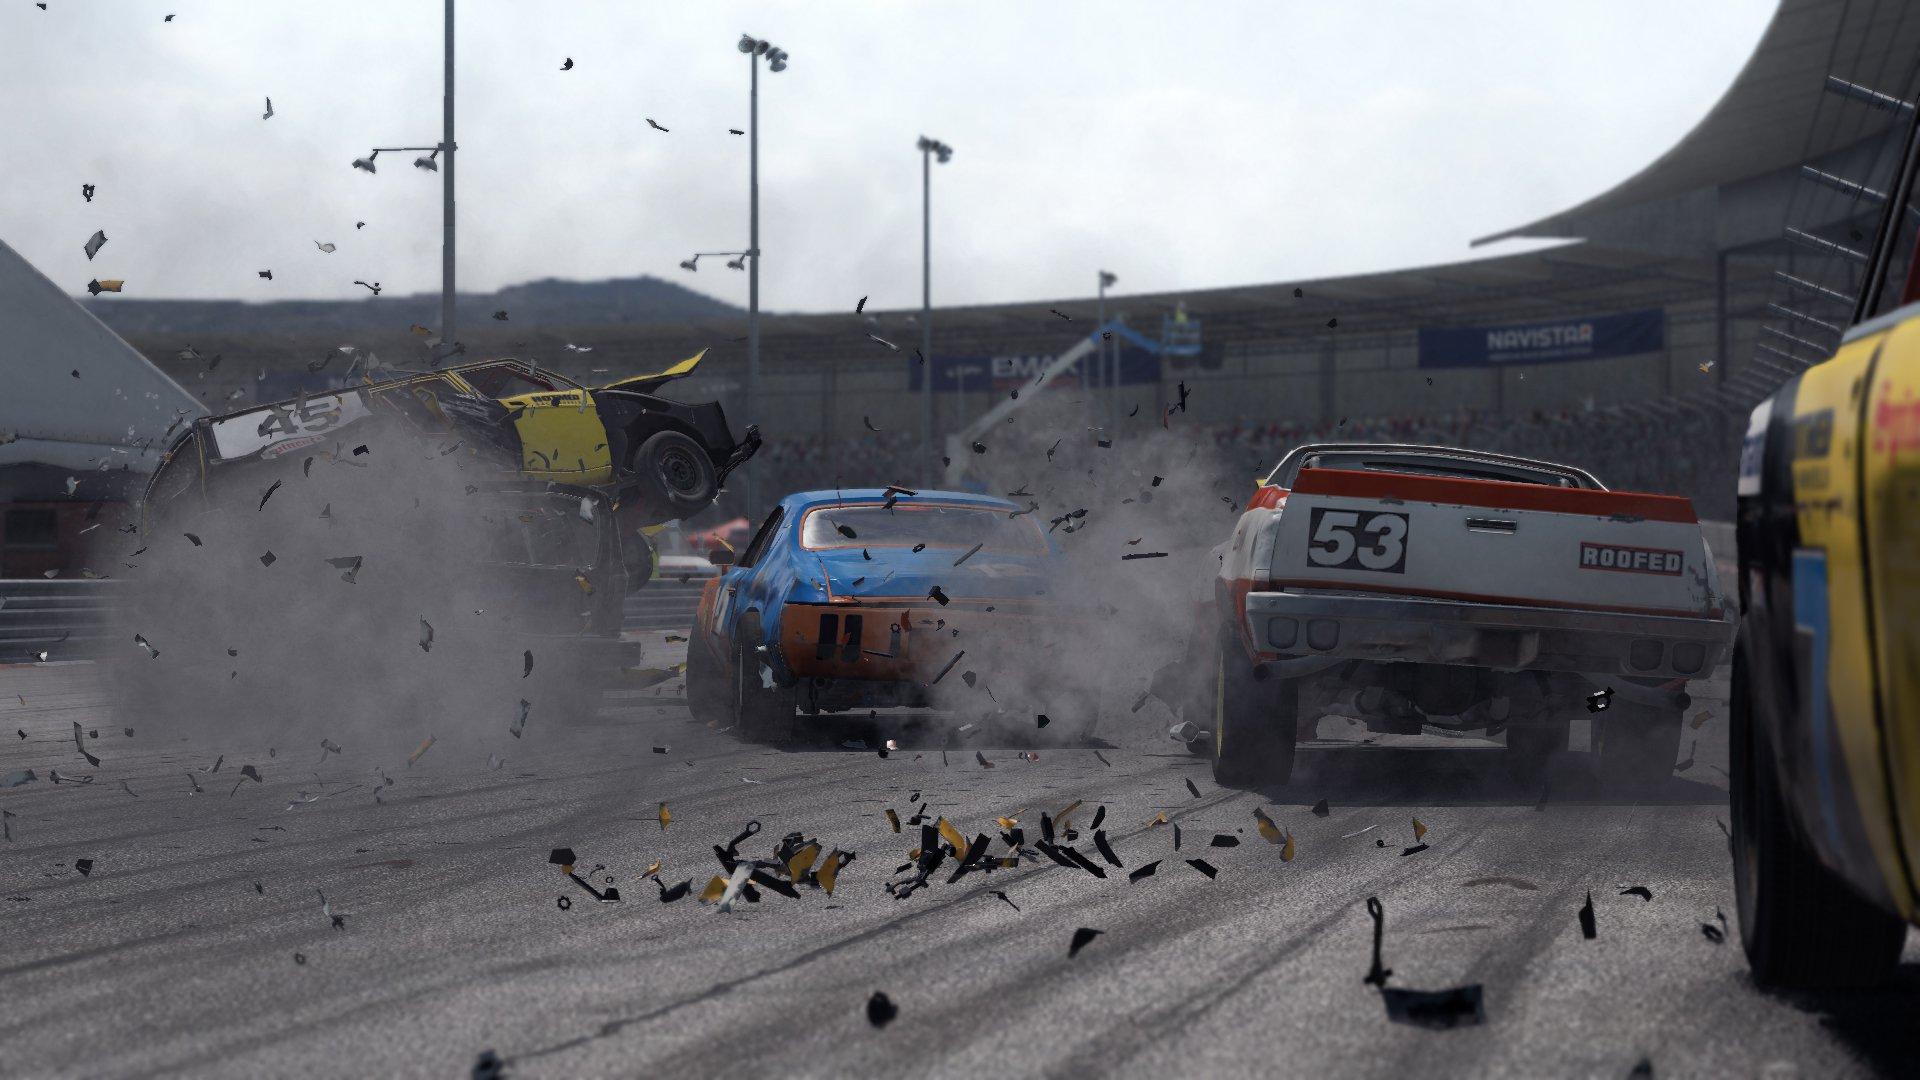 Next Car Game Wreckfest 16